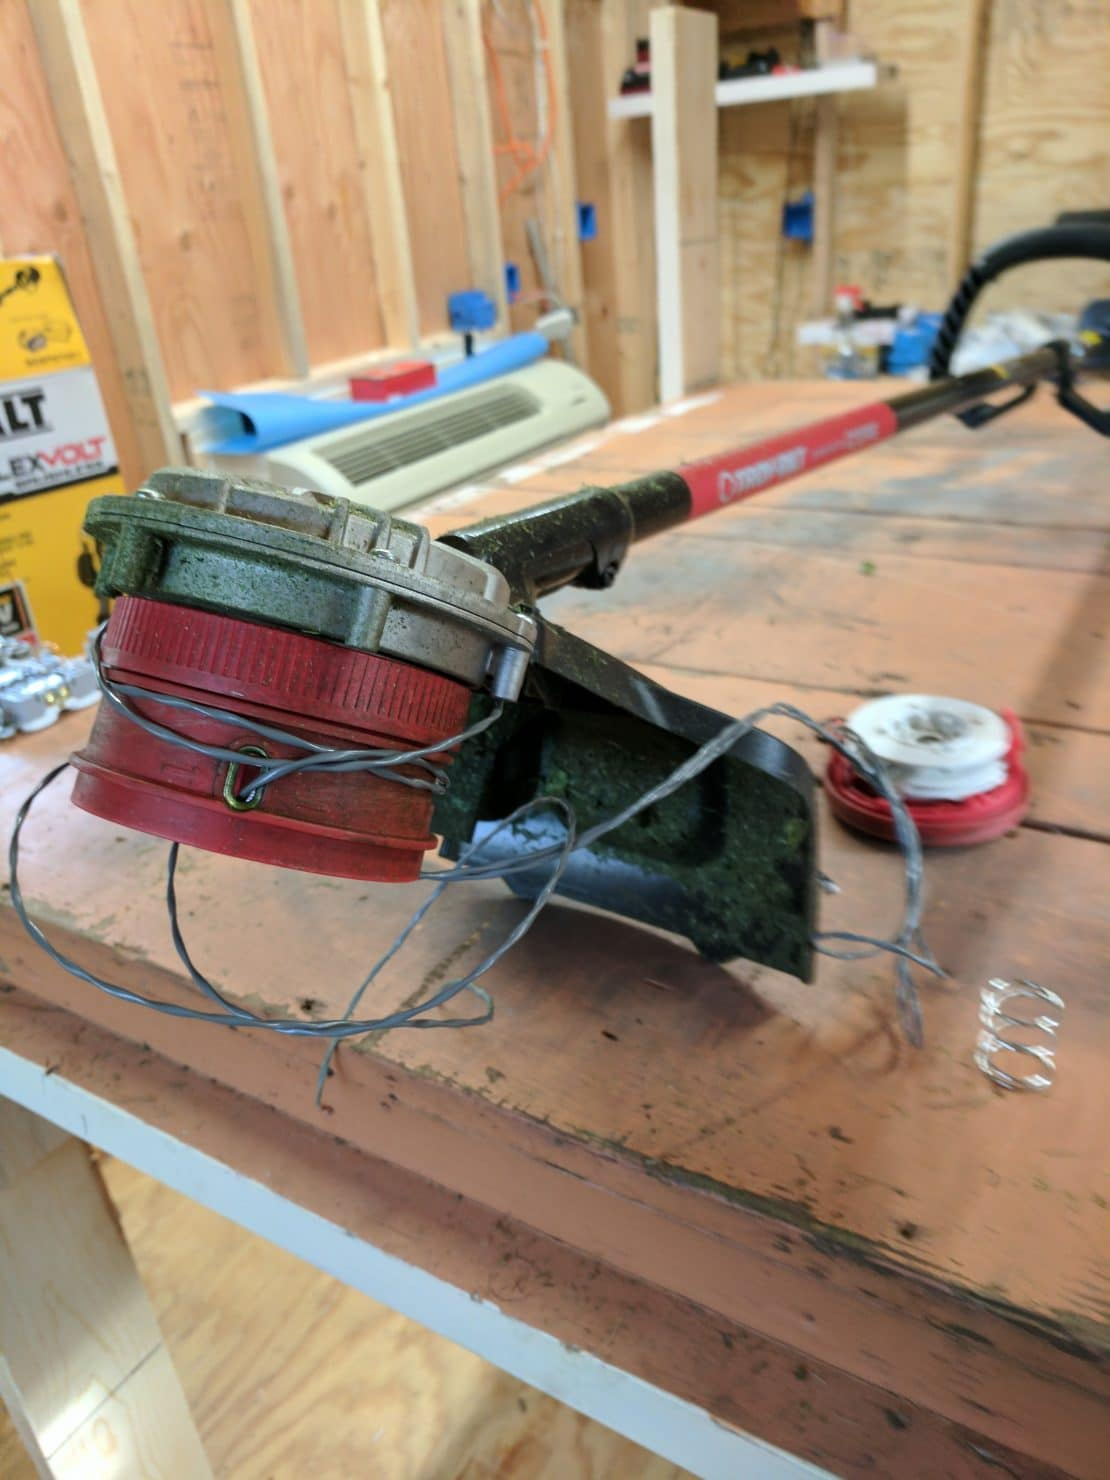 Brushless String Trimmer Shootout! DeWalt, Toro, Stihl, Troy